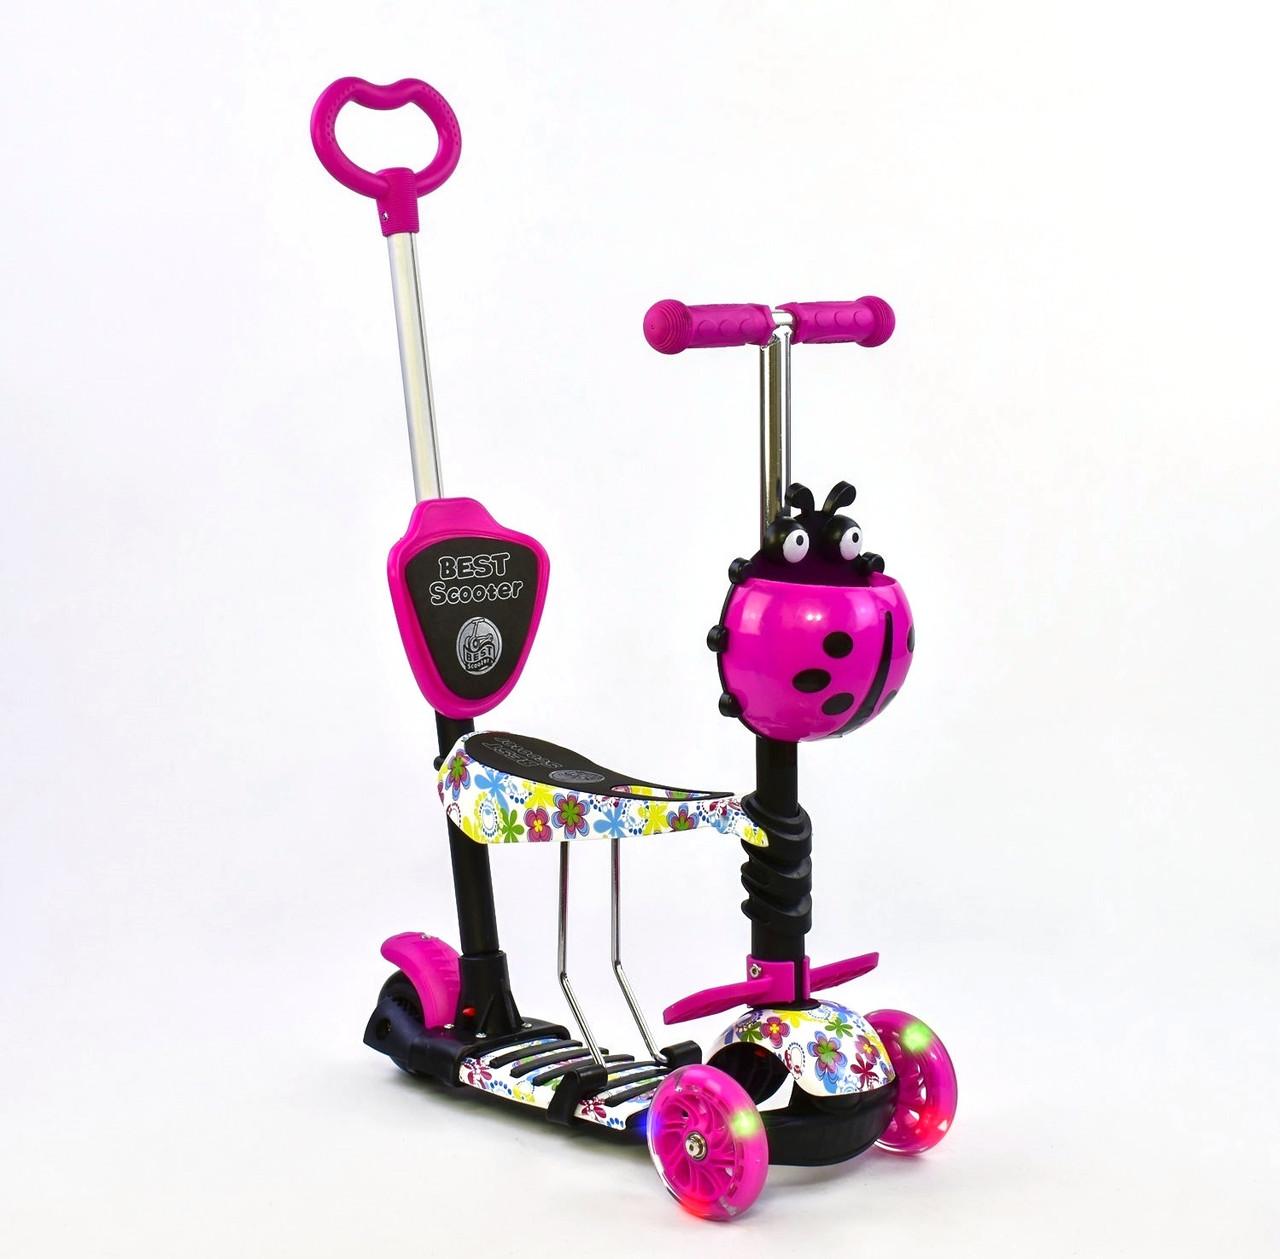 Детский самокат 5в1 Best Scooter 62310